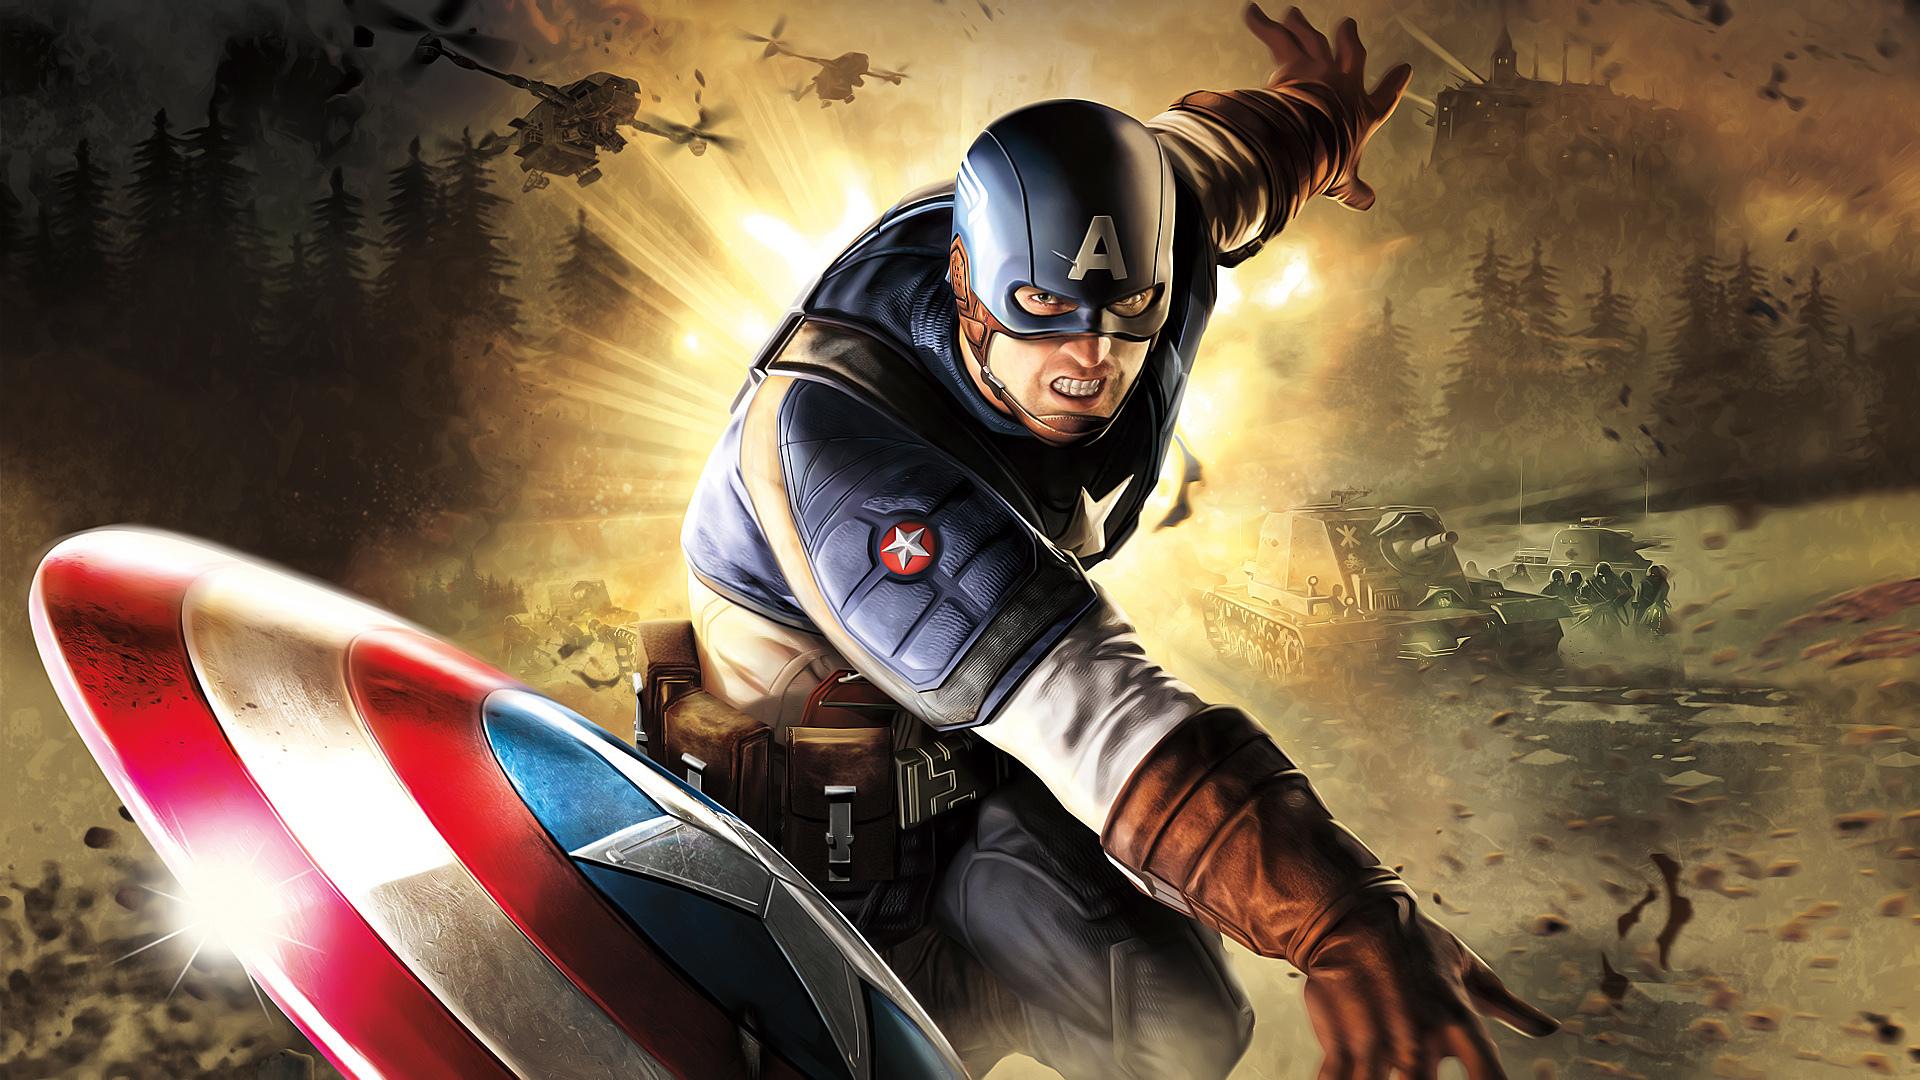 Captain america hd wallpaper background image 1920x1080 id 211685 wallpaper abyss - Image captain america ...